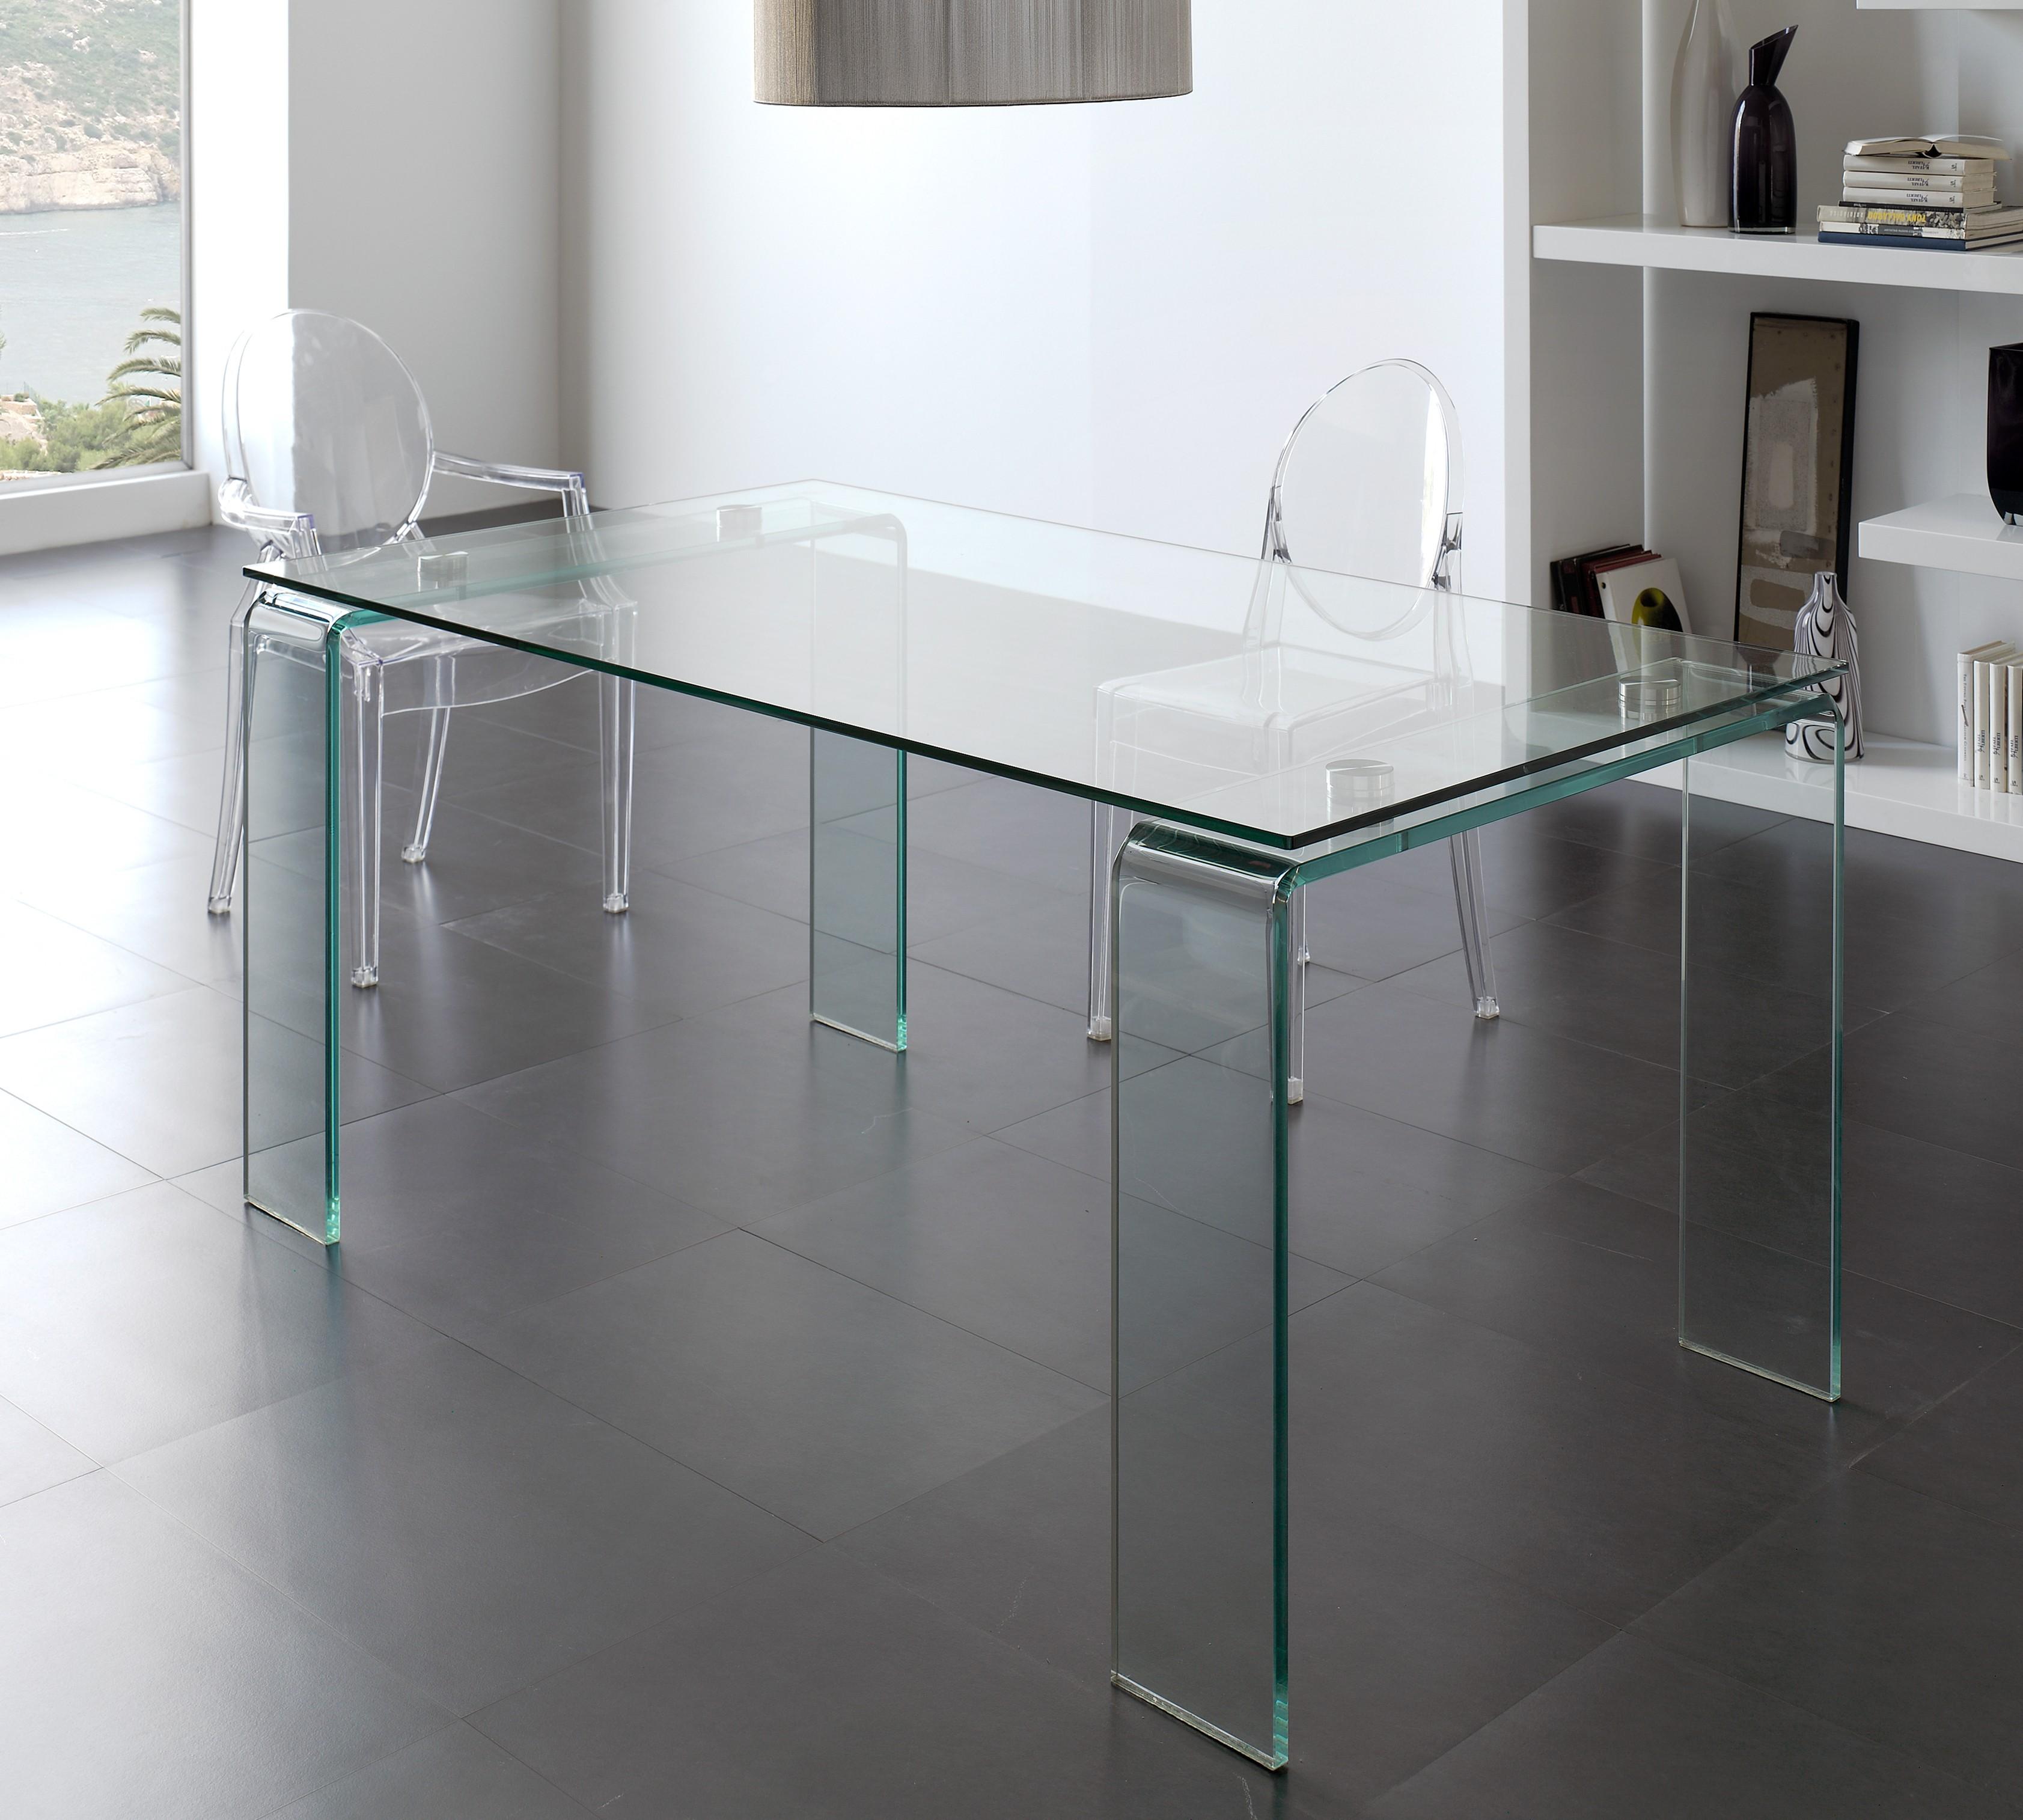 table rectangulaire en verre tremp kancia. Black Bedroom Furniture Sets. Home Design Ideas